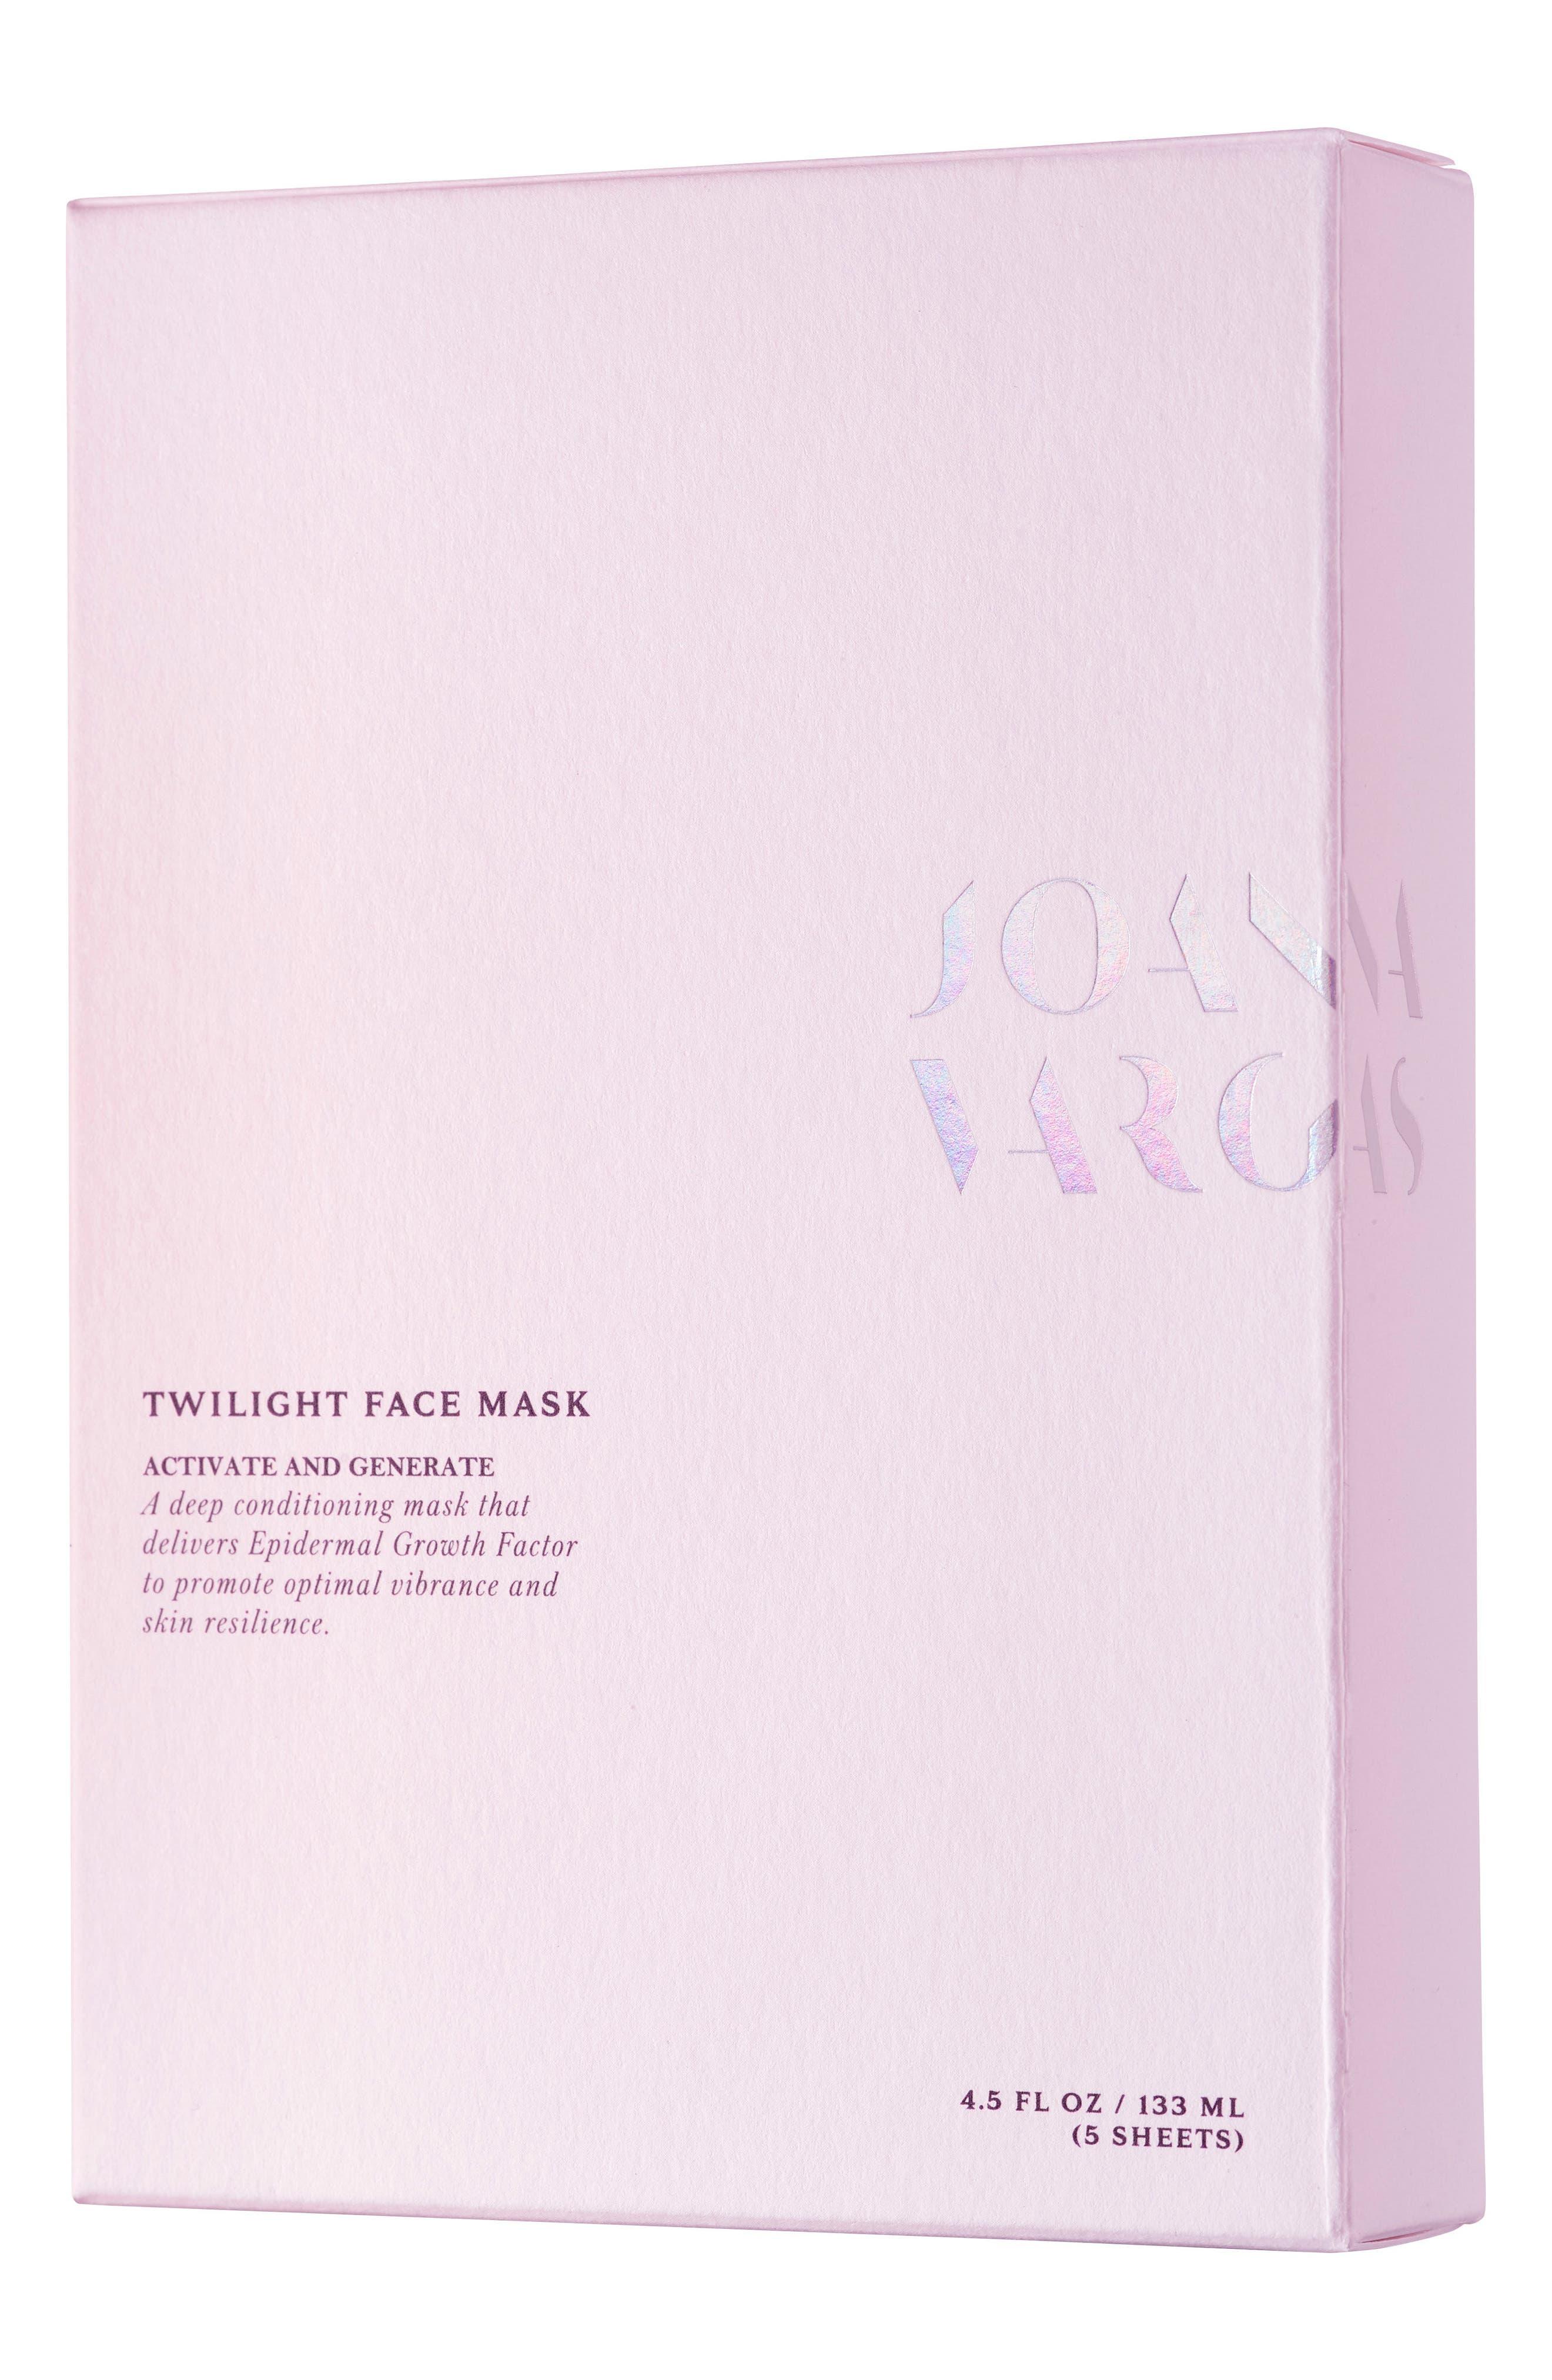 Twilight Face Mask,                             Alternate thumbnail 2, color,                             NO COLOR